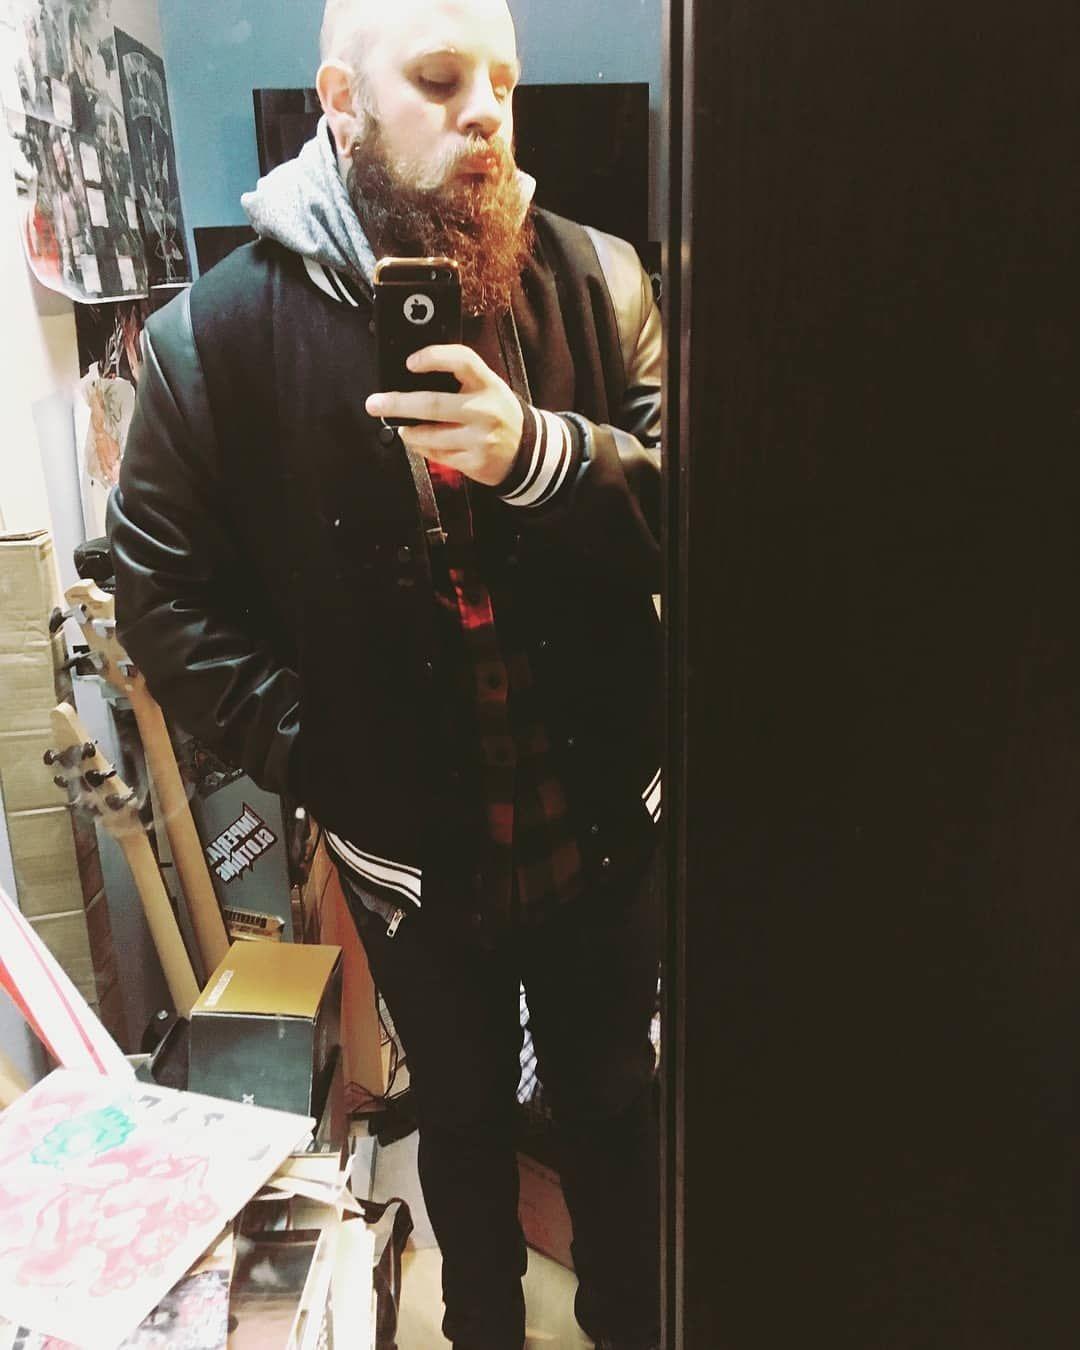 Go to city  #altboy#european#´#picture#barbu#tattoo#ink#inkedboy##metalgirl#bearded #beard#ink#inkedboy#metalhead#barbu##model##inkaddicts#alternativeboy #impericon# #metalgirl#metal #altmodel#armtattoo#usa#horror#modelphotography#beardmodeling##tattooedpeople#tattooedguys#blackmetalgirl#percings#geek#vikings #tattoomodel#bucheron